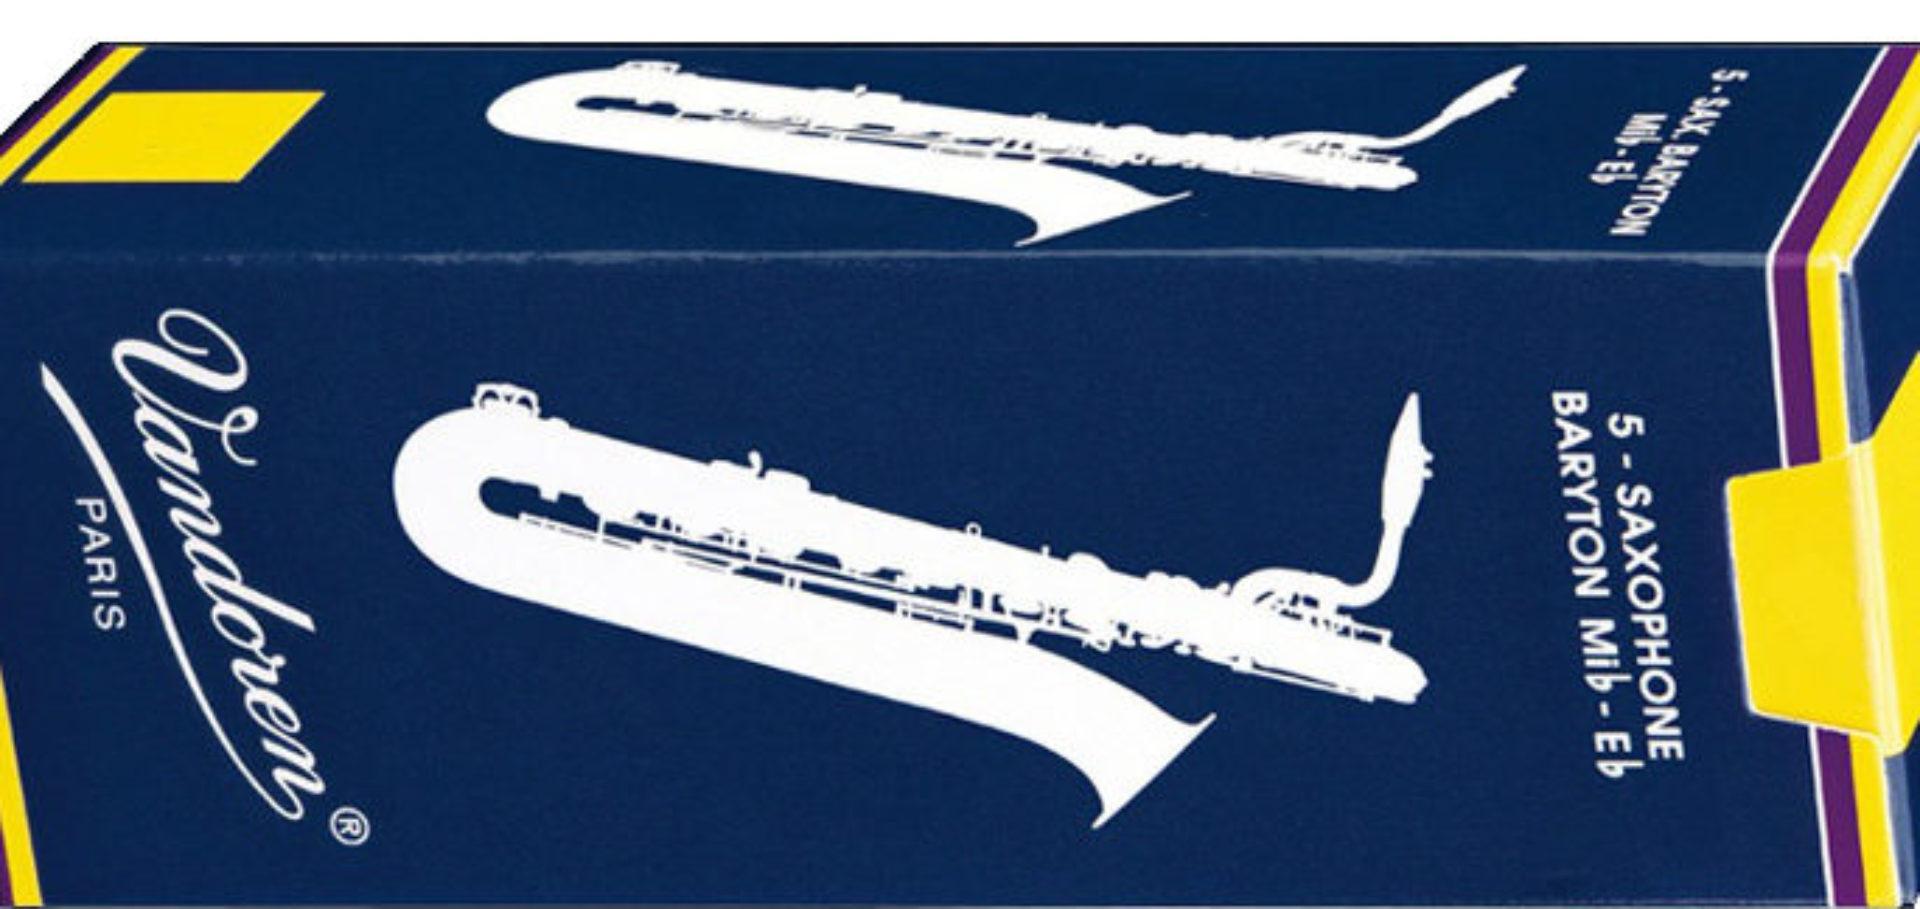 Vandoren Classic Blue Bari Saxofon Reeds